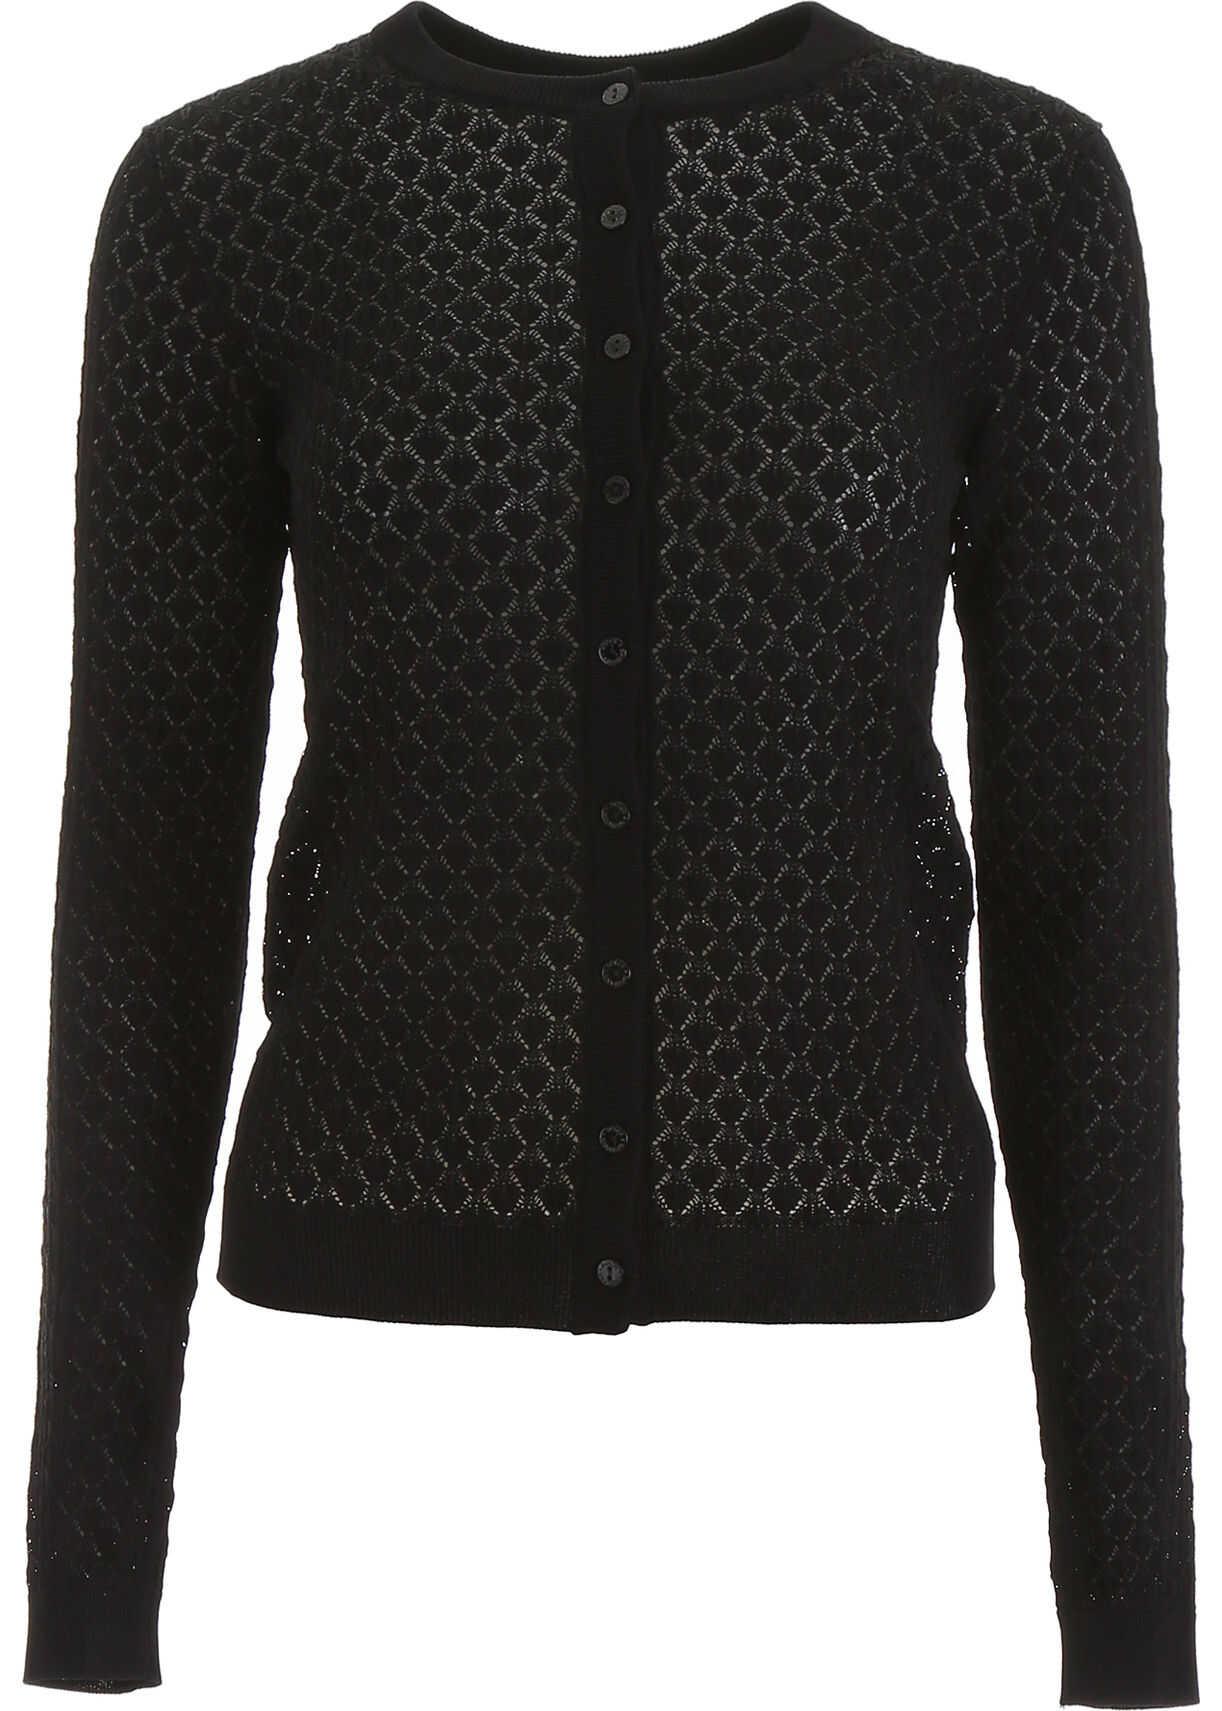 Dolce & Gabbana Knit Cardigan NERO